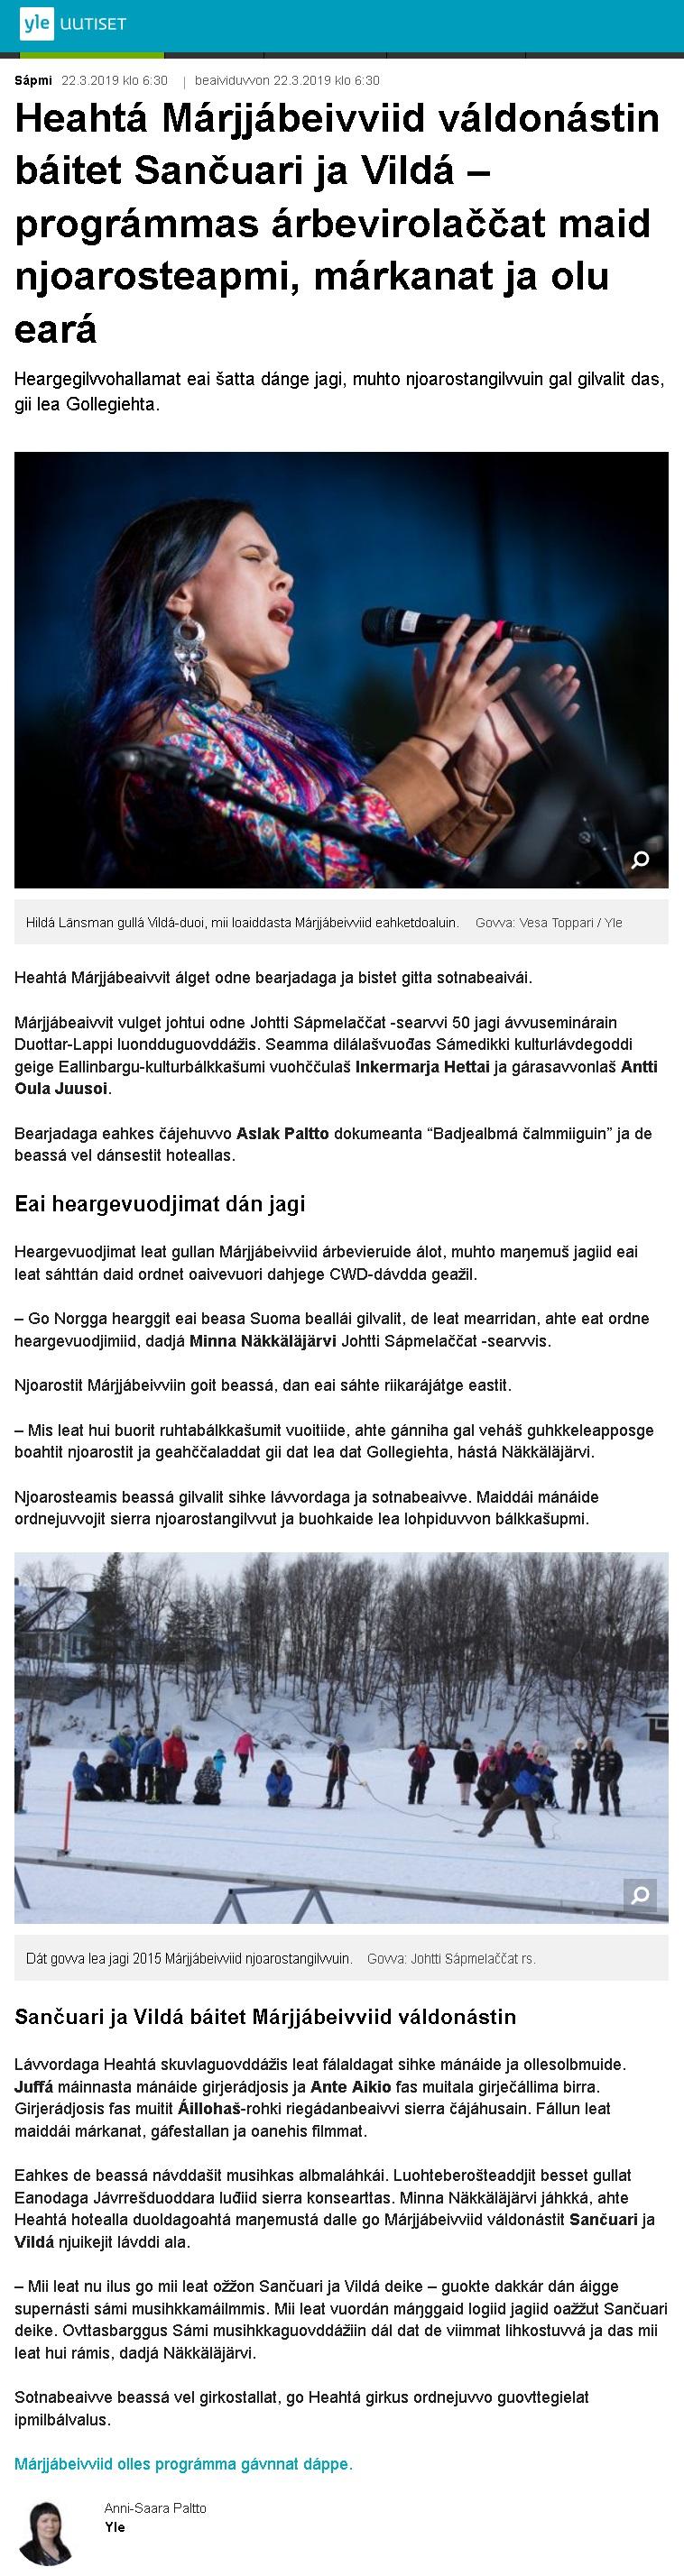 Yle Sápmi (Finland), 22.3.2019